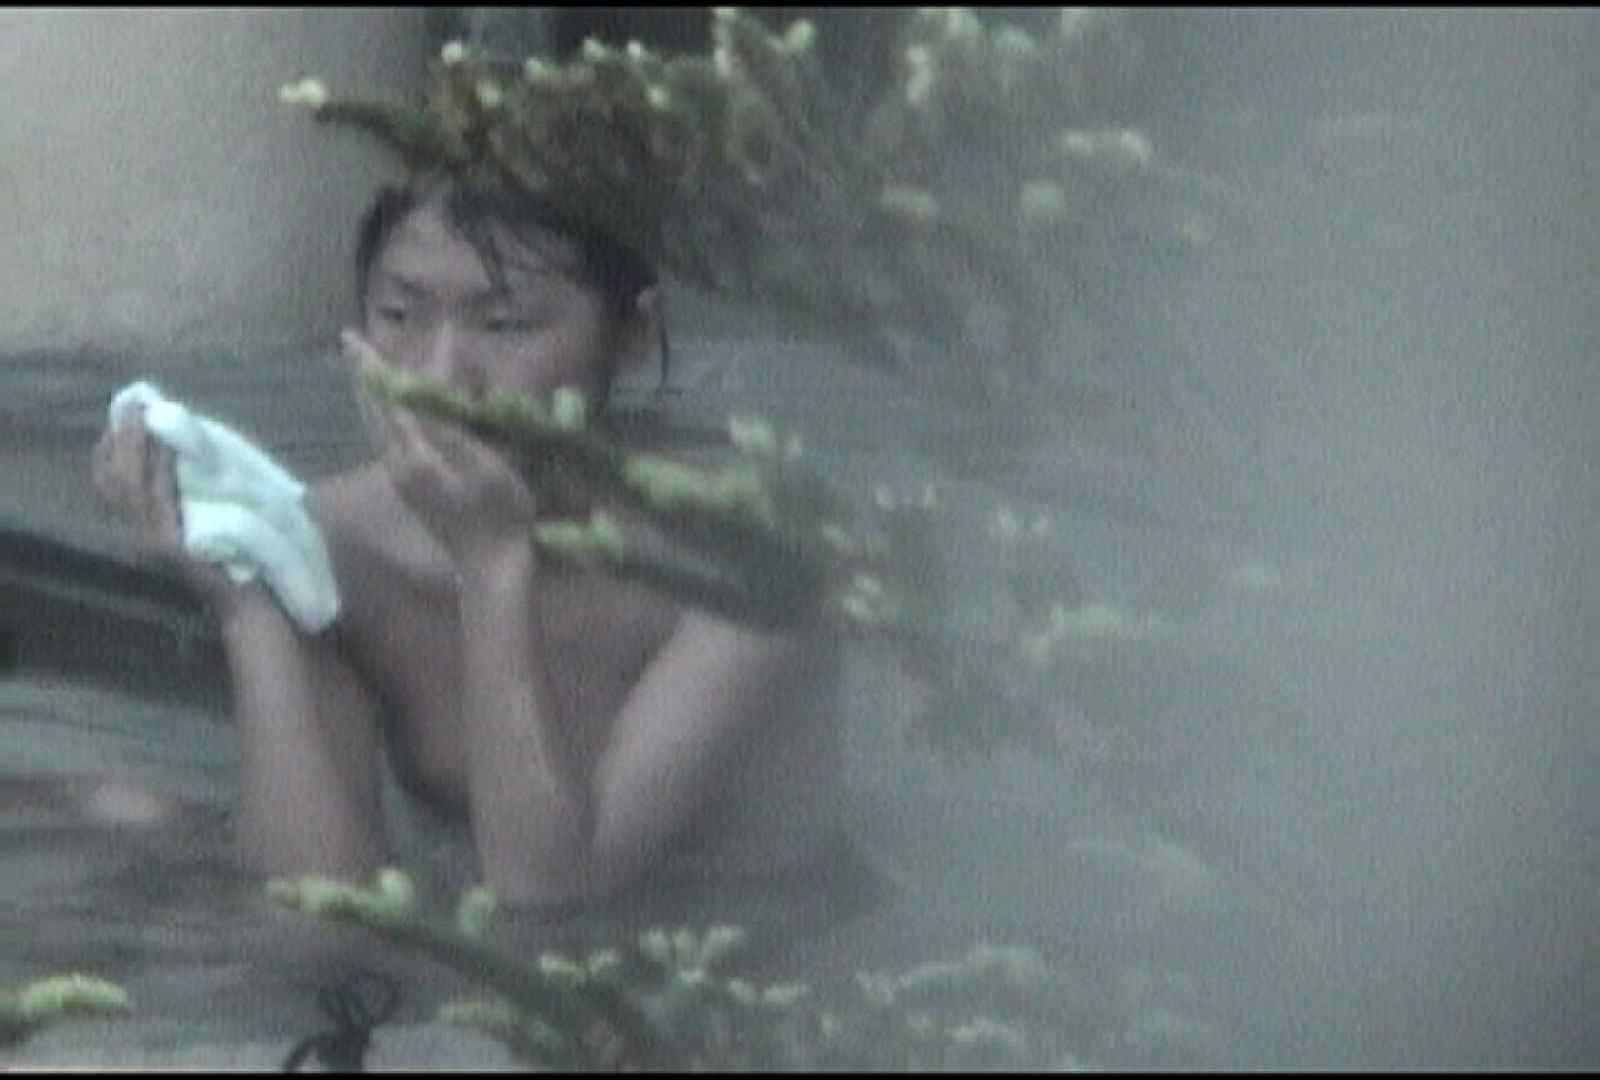 Aquaな露天風呂Vol.15 盗撮映像  42Pix 14